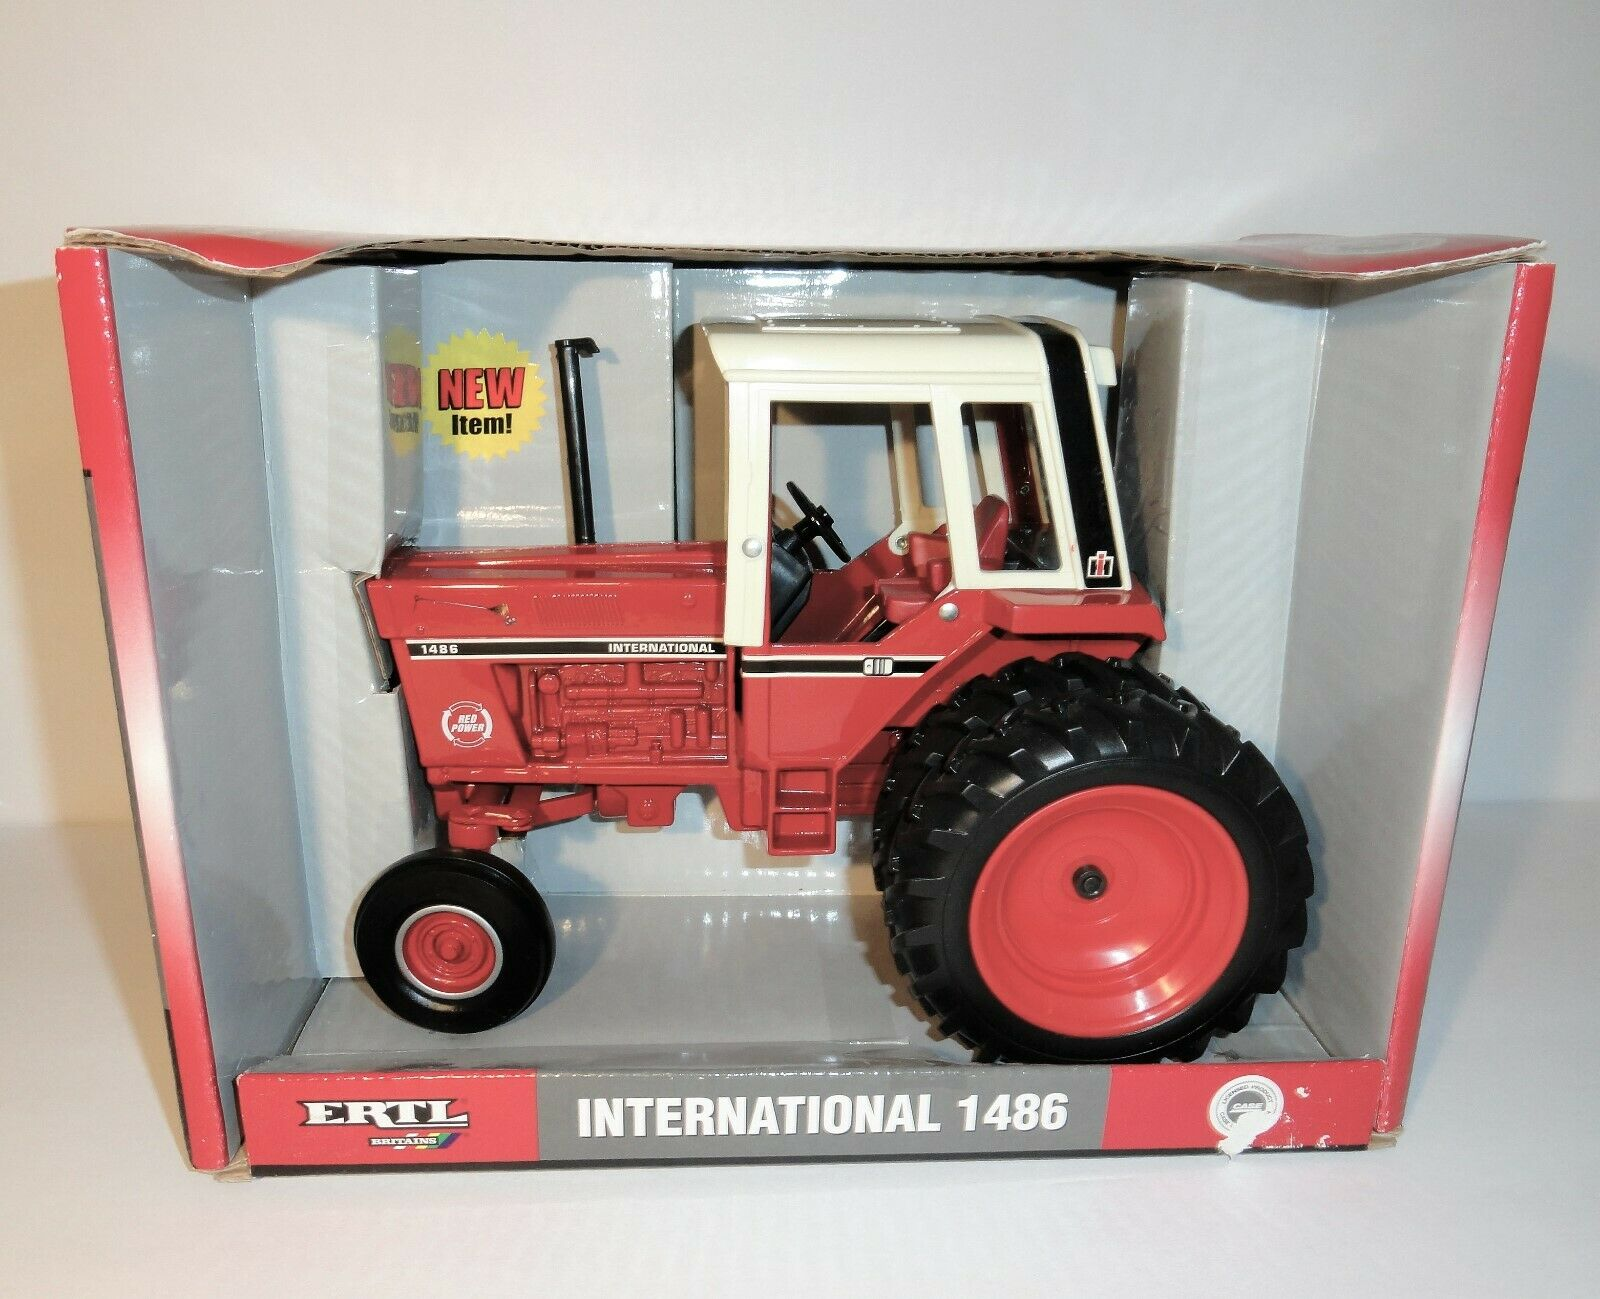 ERTL International 1486 tracteur avec large Duals-In Box 1 16 Scale